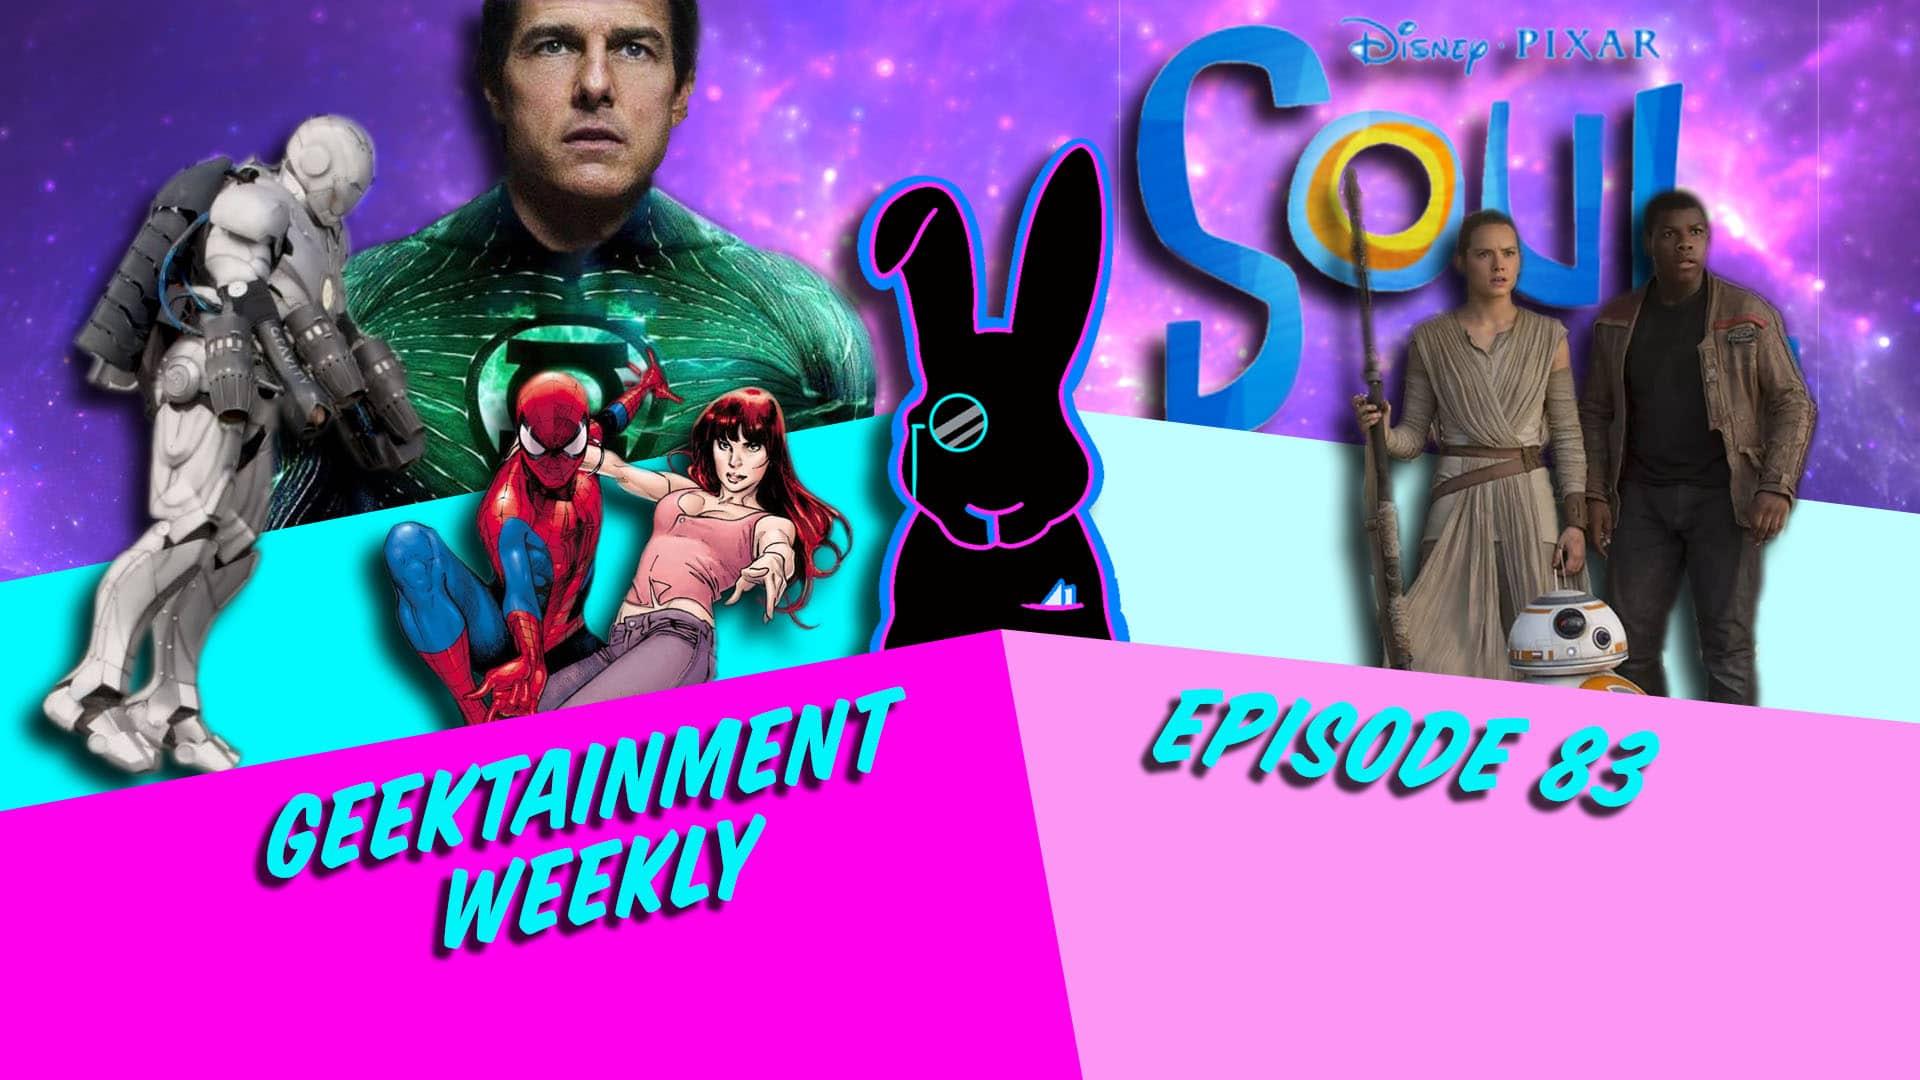 Geektainment Weekly - Episode 83